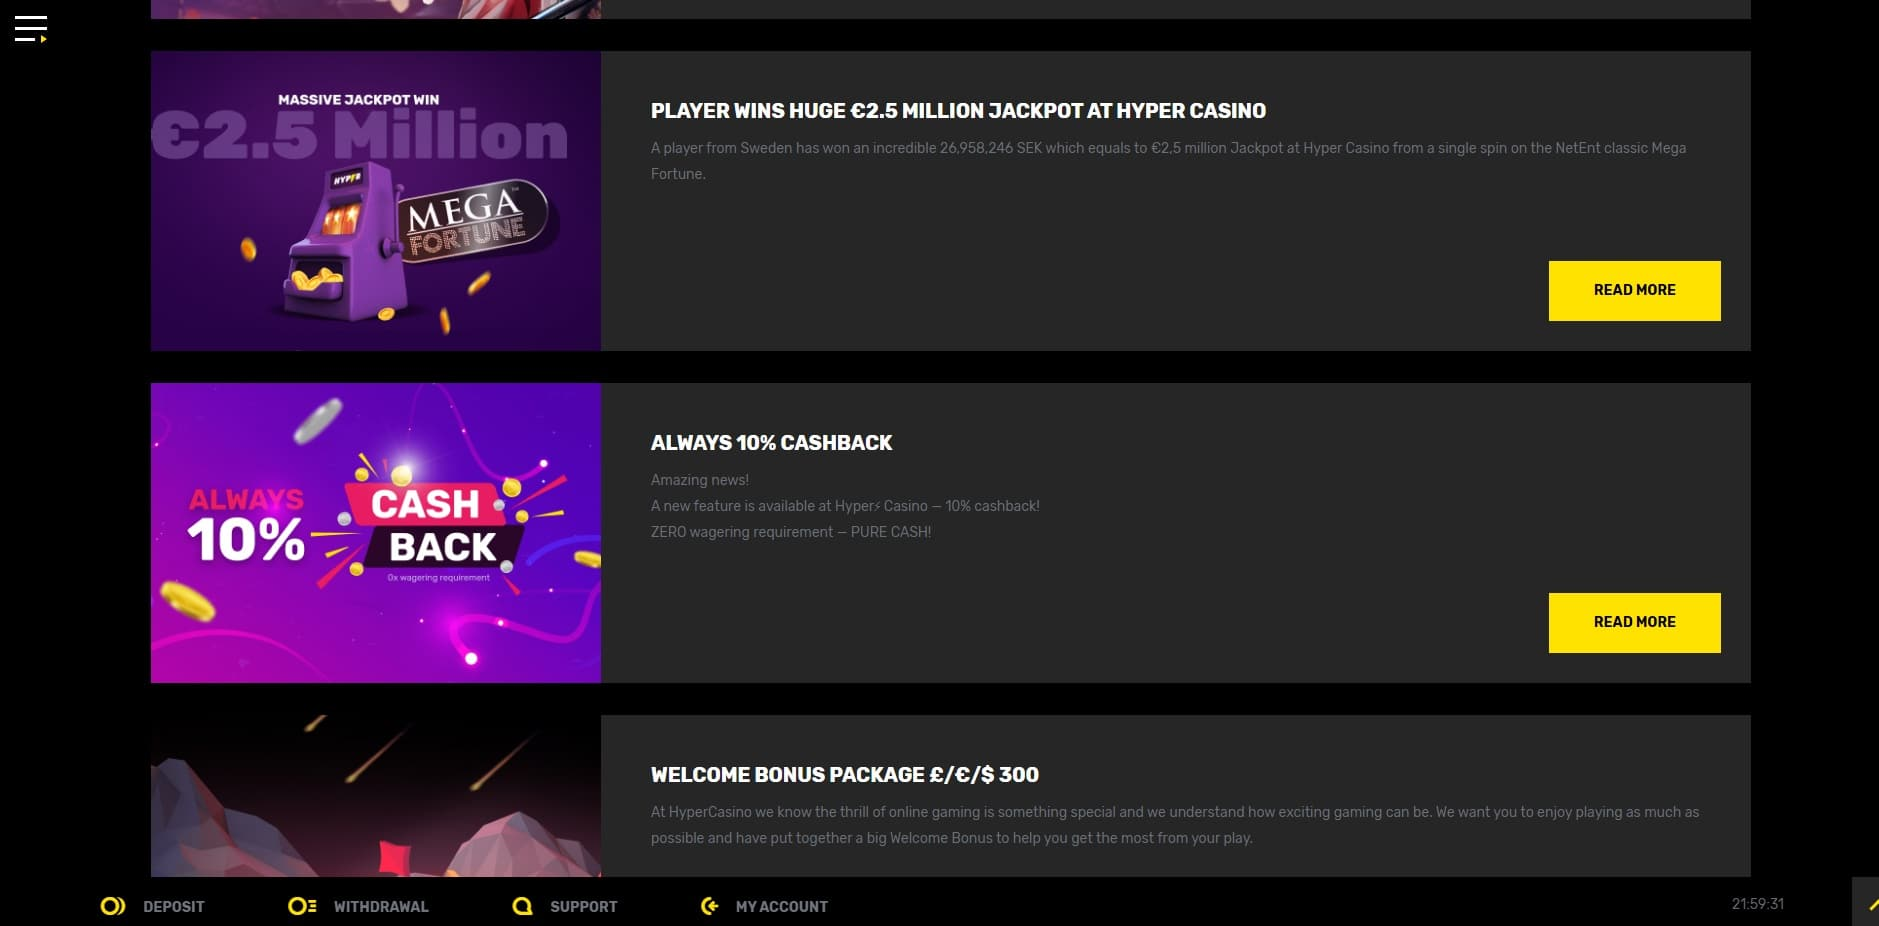 Hyper casino promotions-min